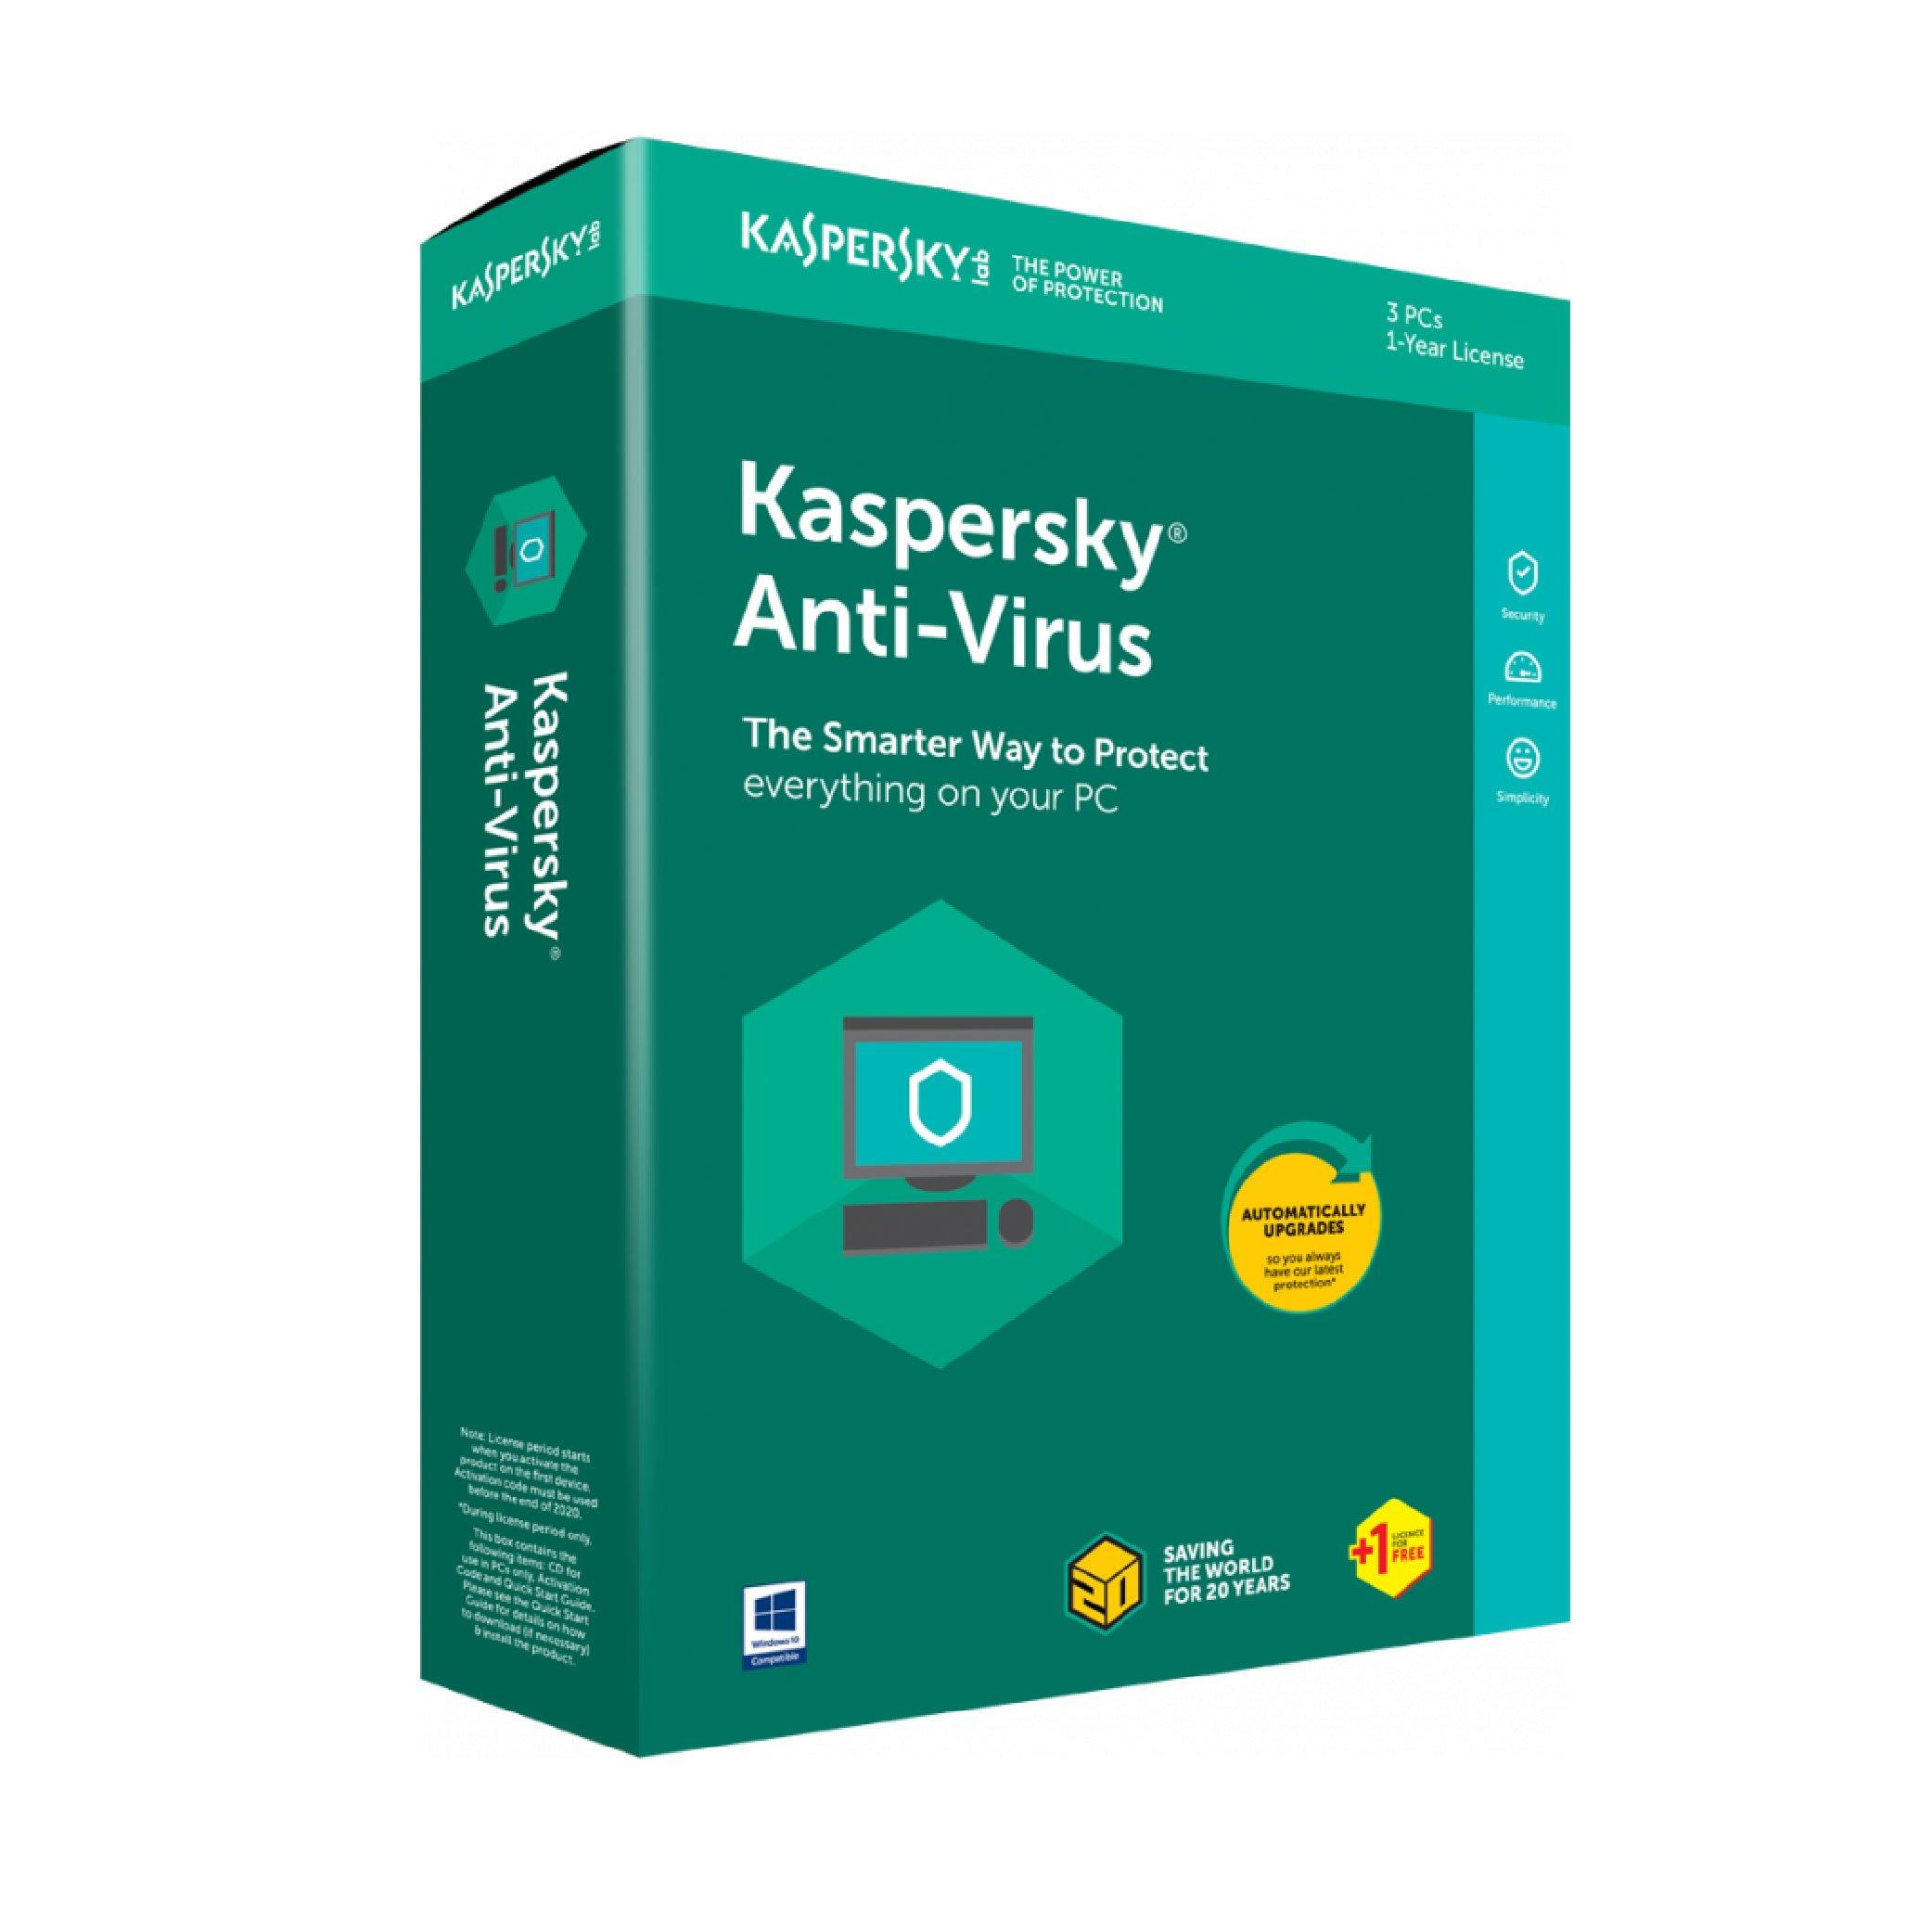 KASPERSKY ANTIVIRUS 2020 3+1